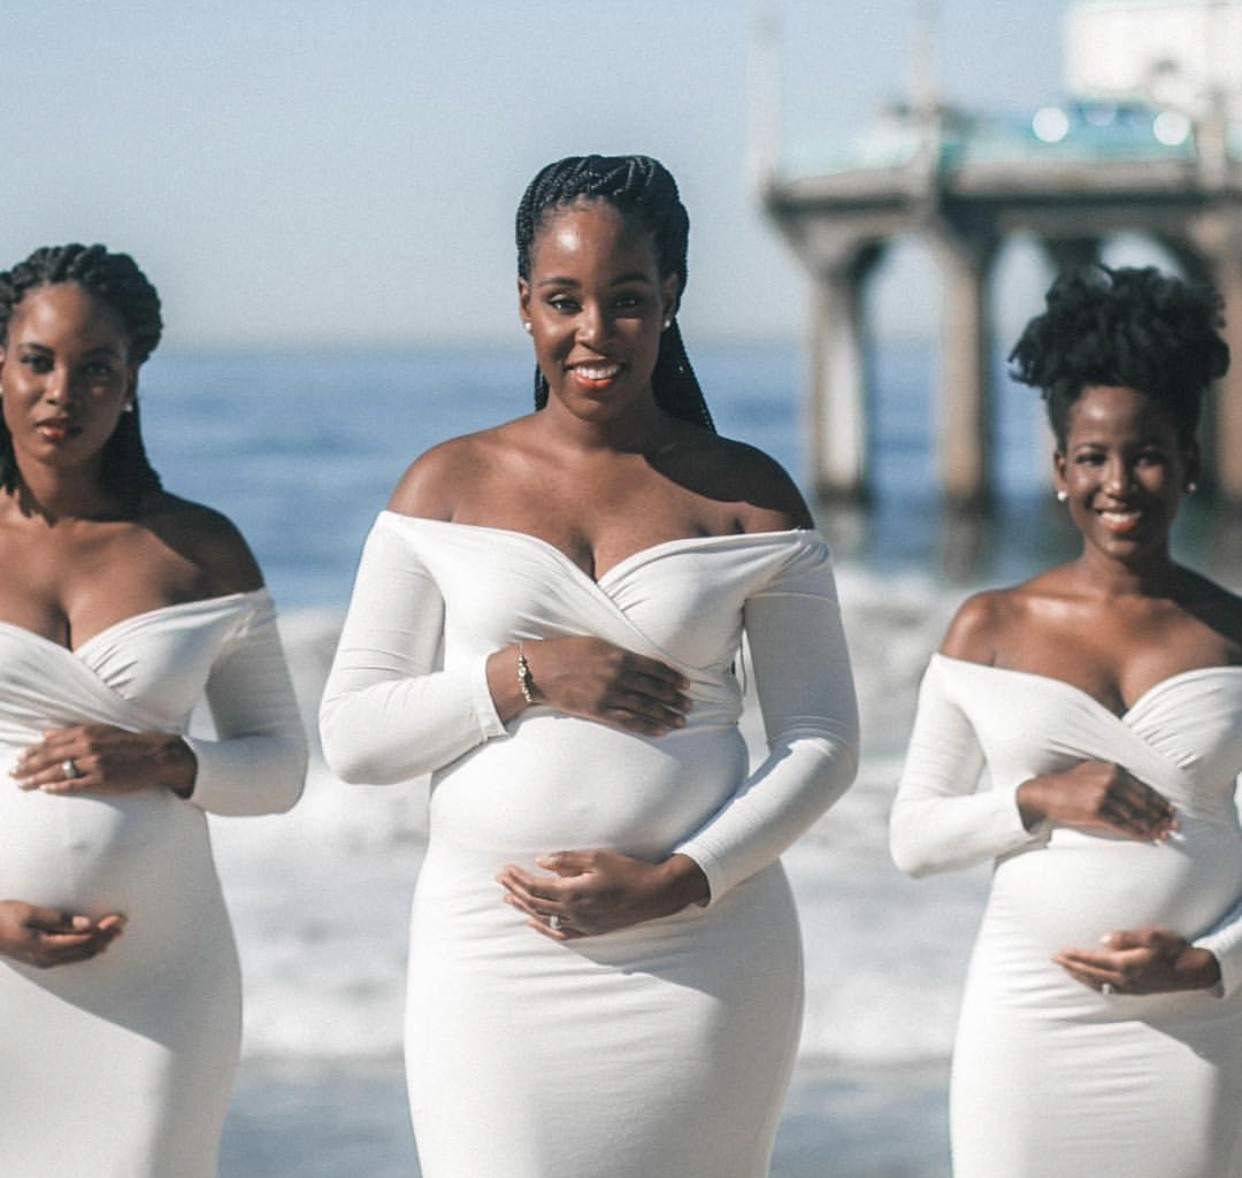 Beautiful maternity photos of 3 pregnant sisters